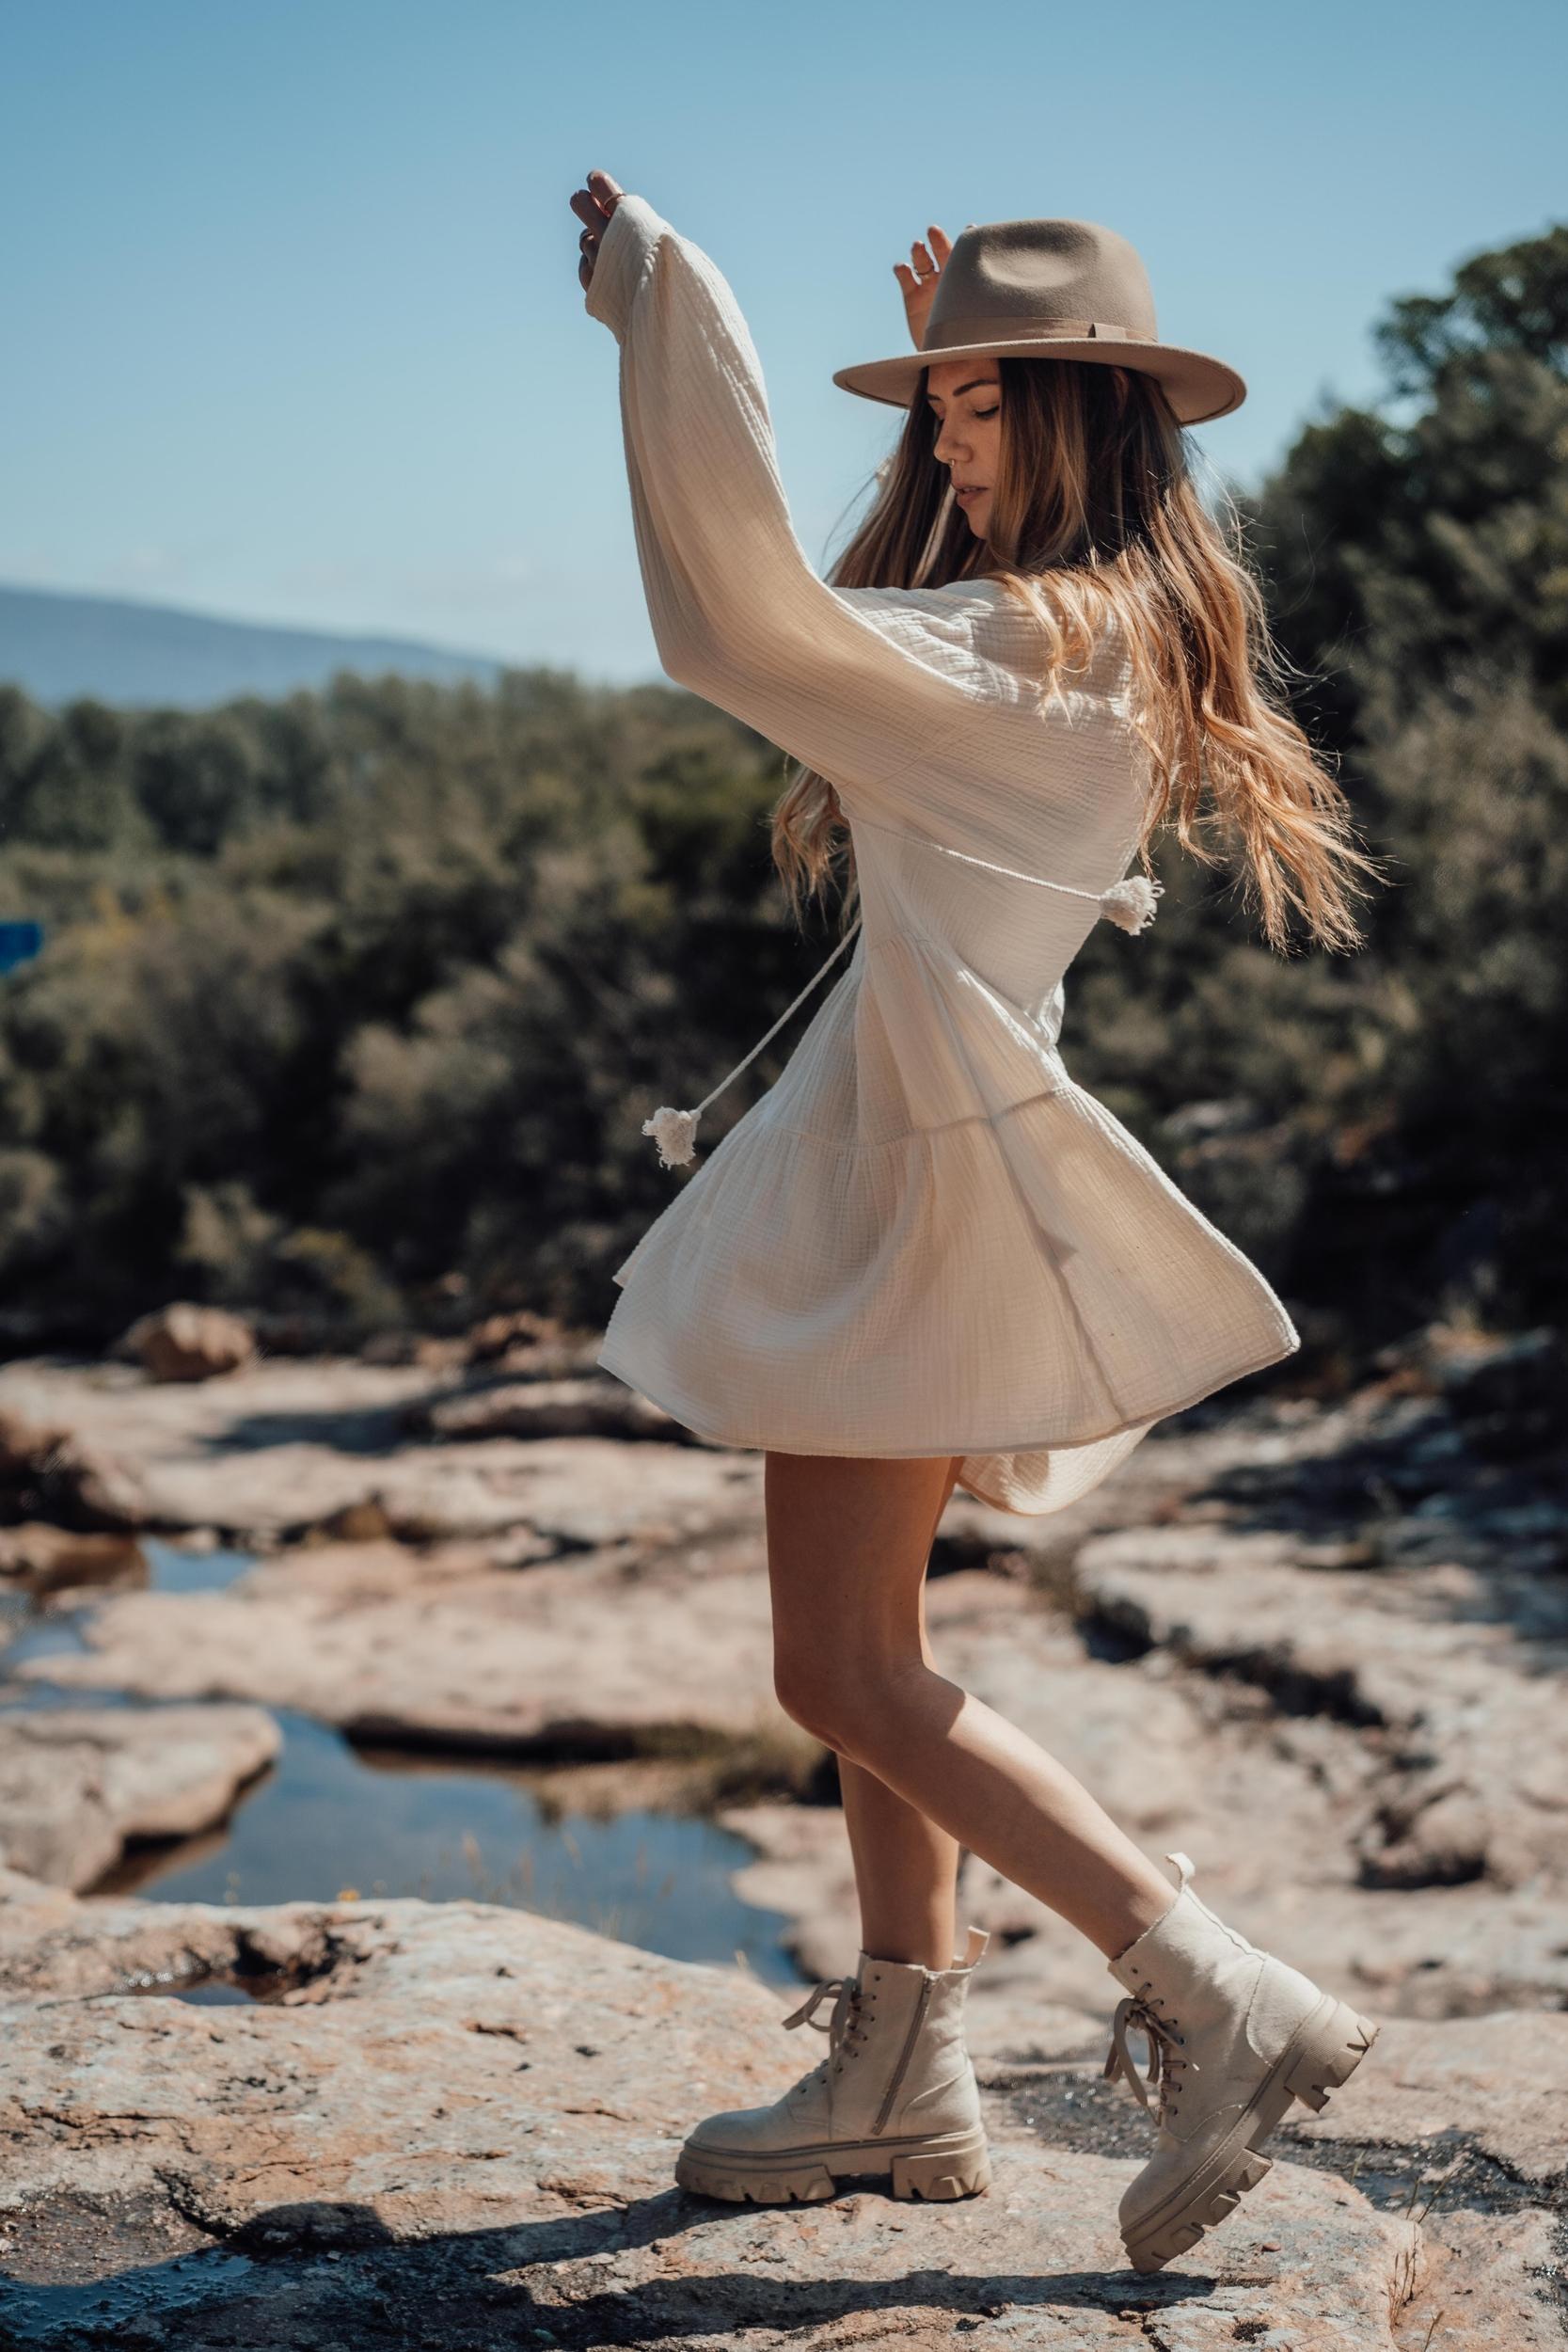 robe_paola_cte_manche_longue_ecru-3